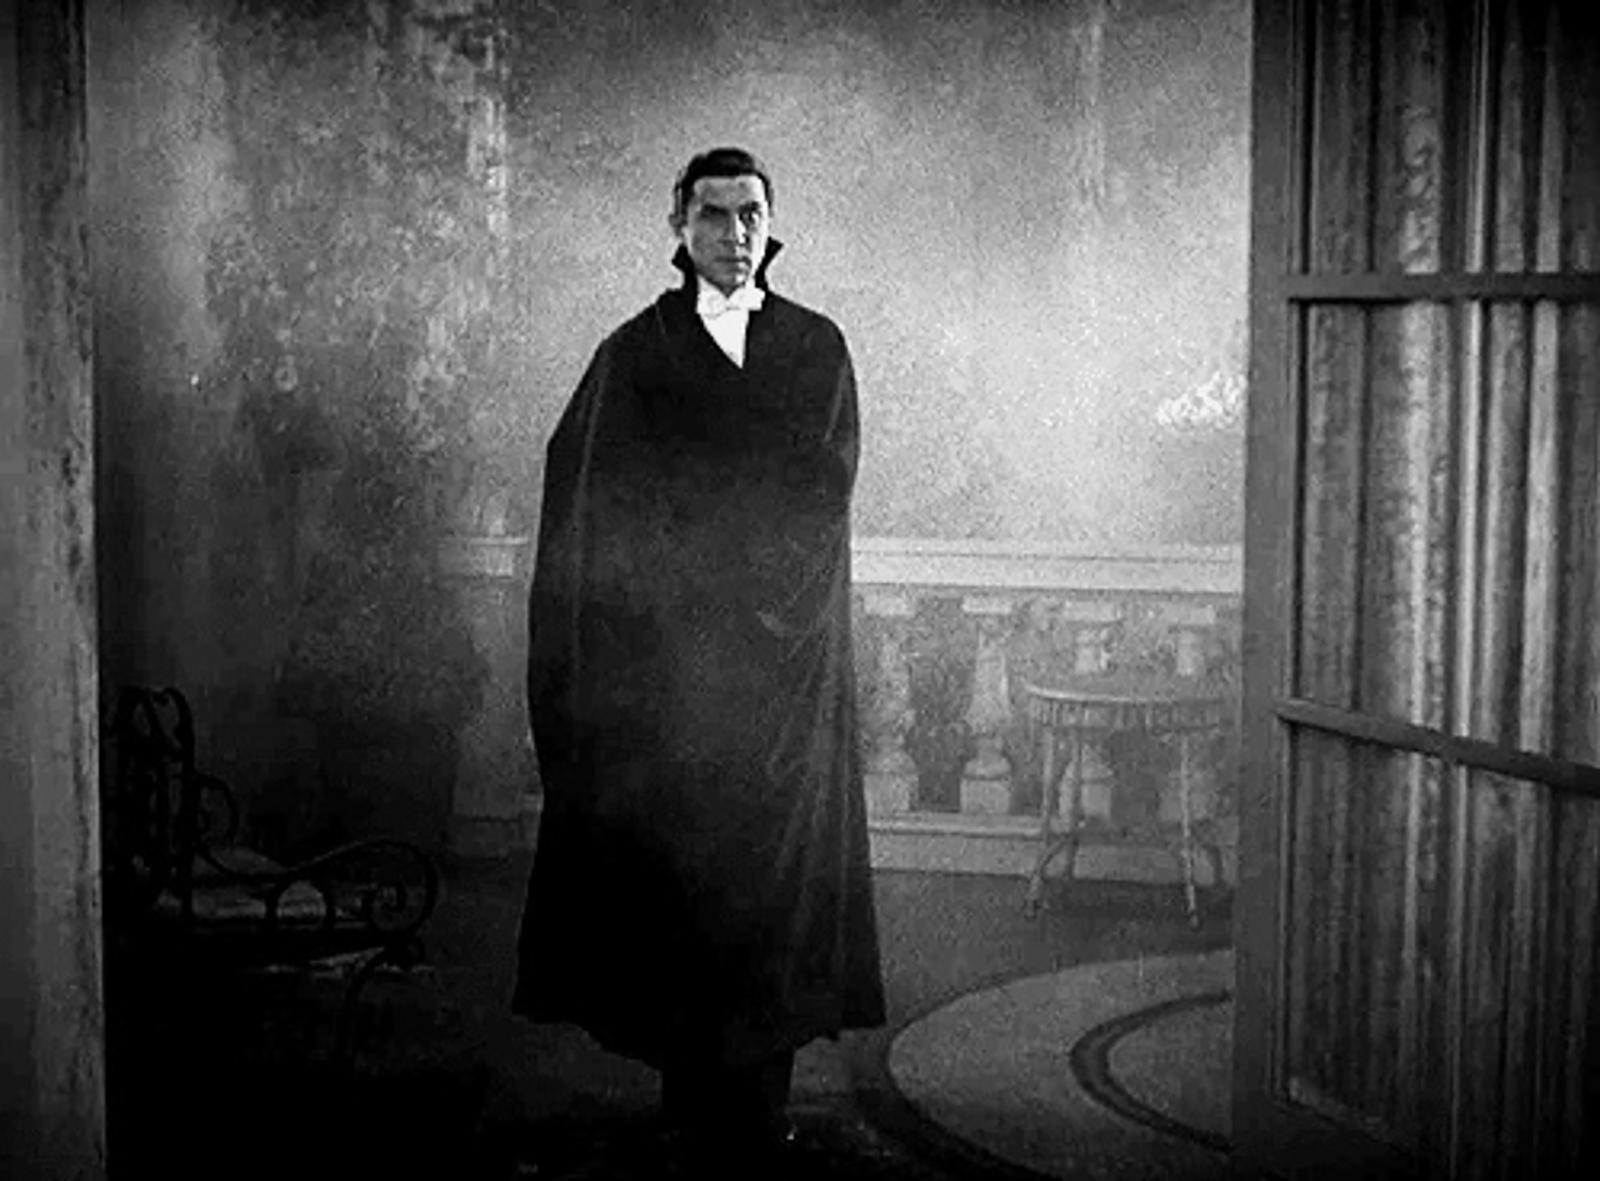 dracula 1931 vintage - photo #5